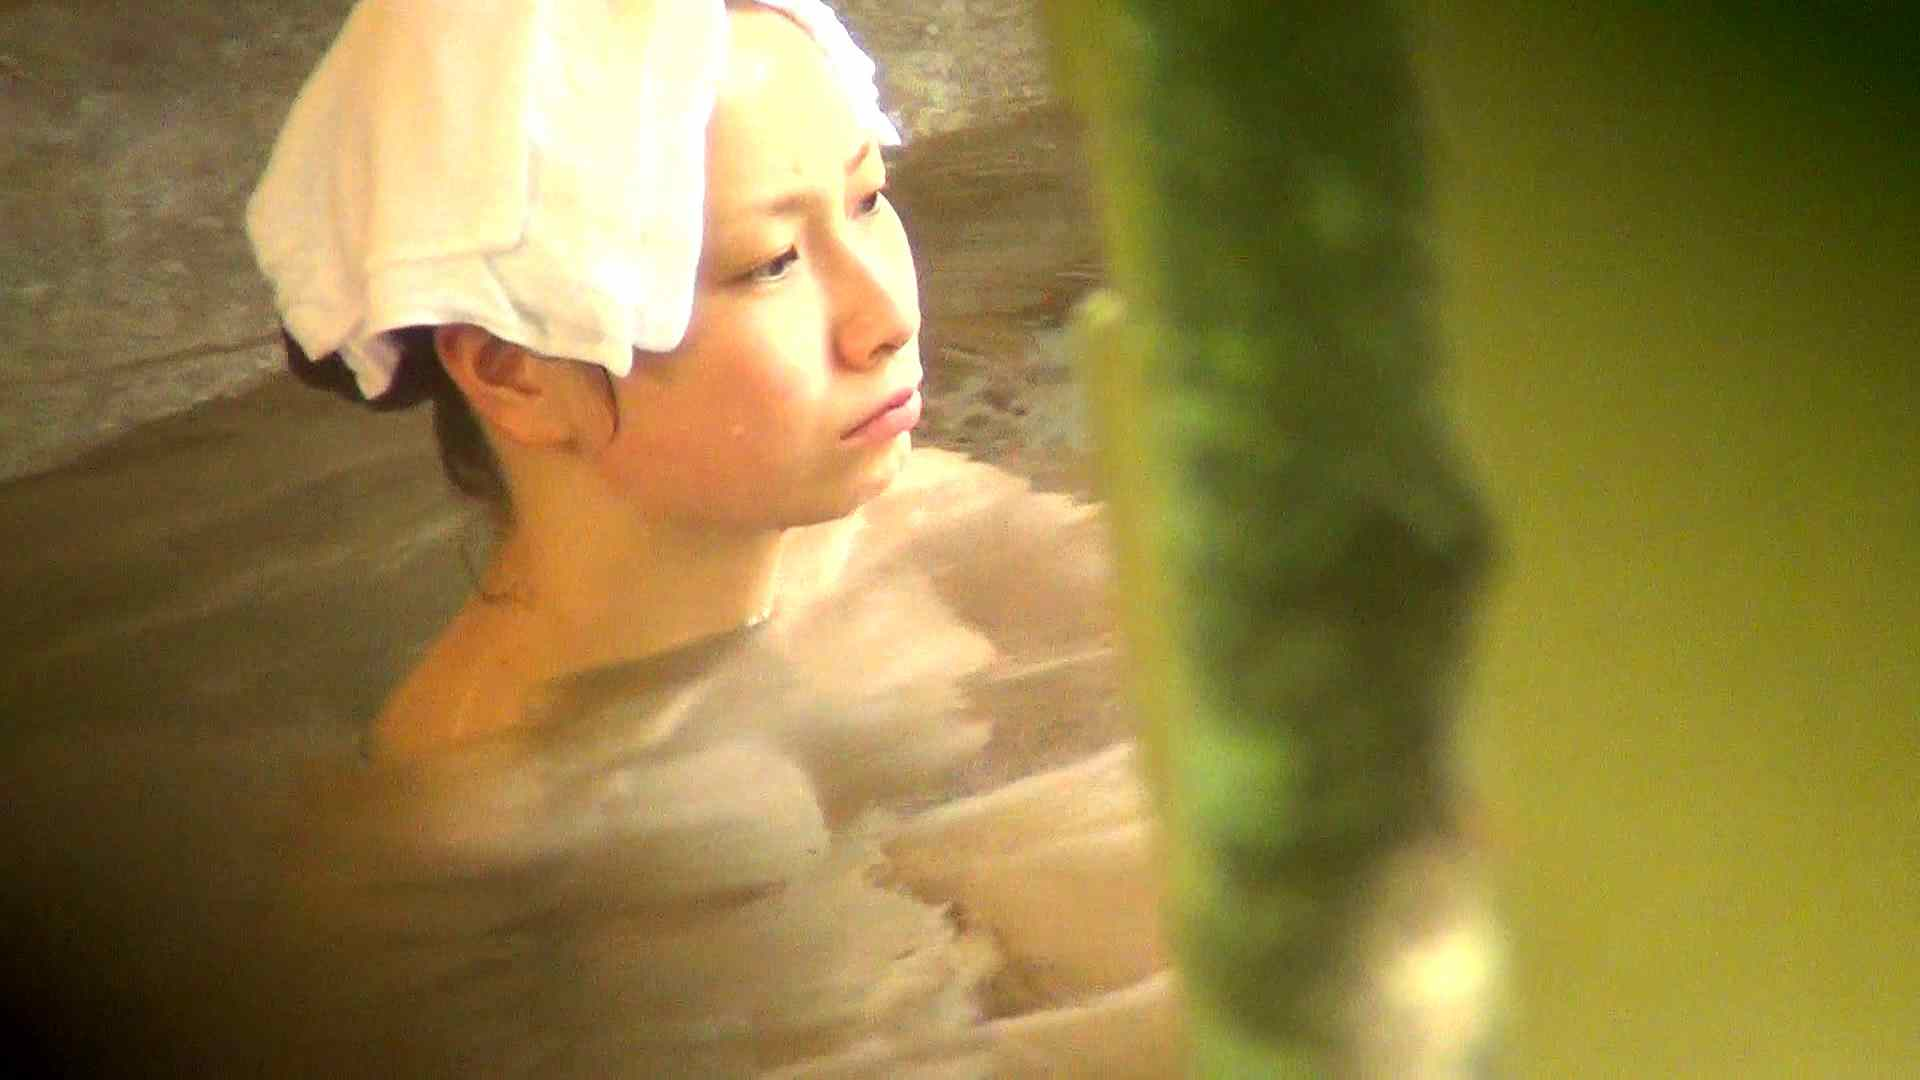 Vol.36 不機嫌な桃色美女 潜伏露天風呂 覗きワレメ動画紹介 80pic 65